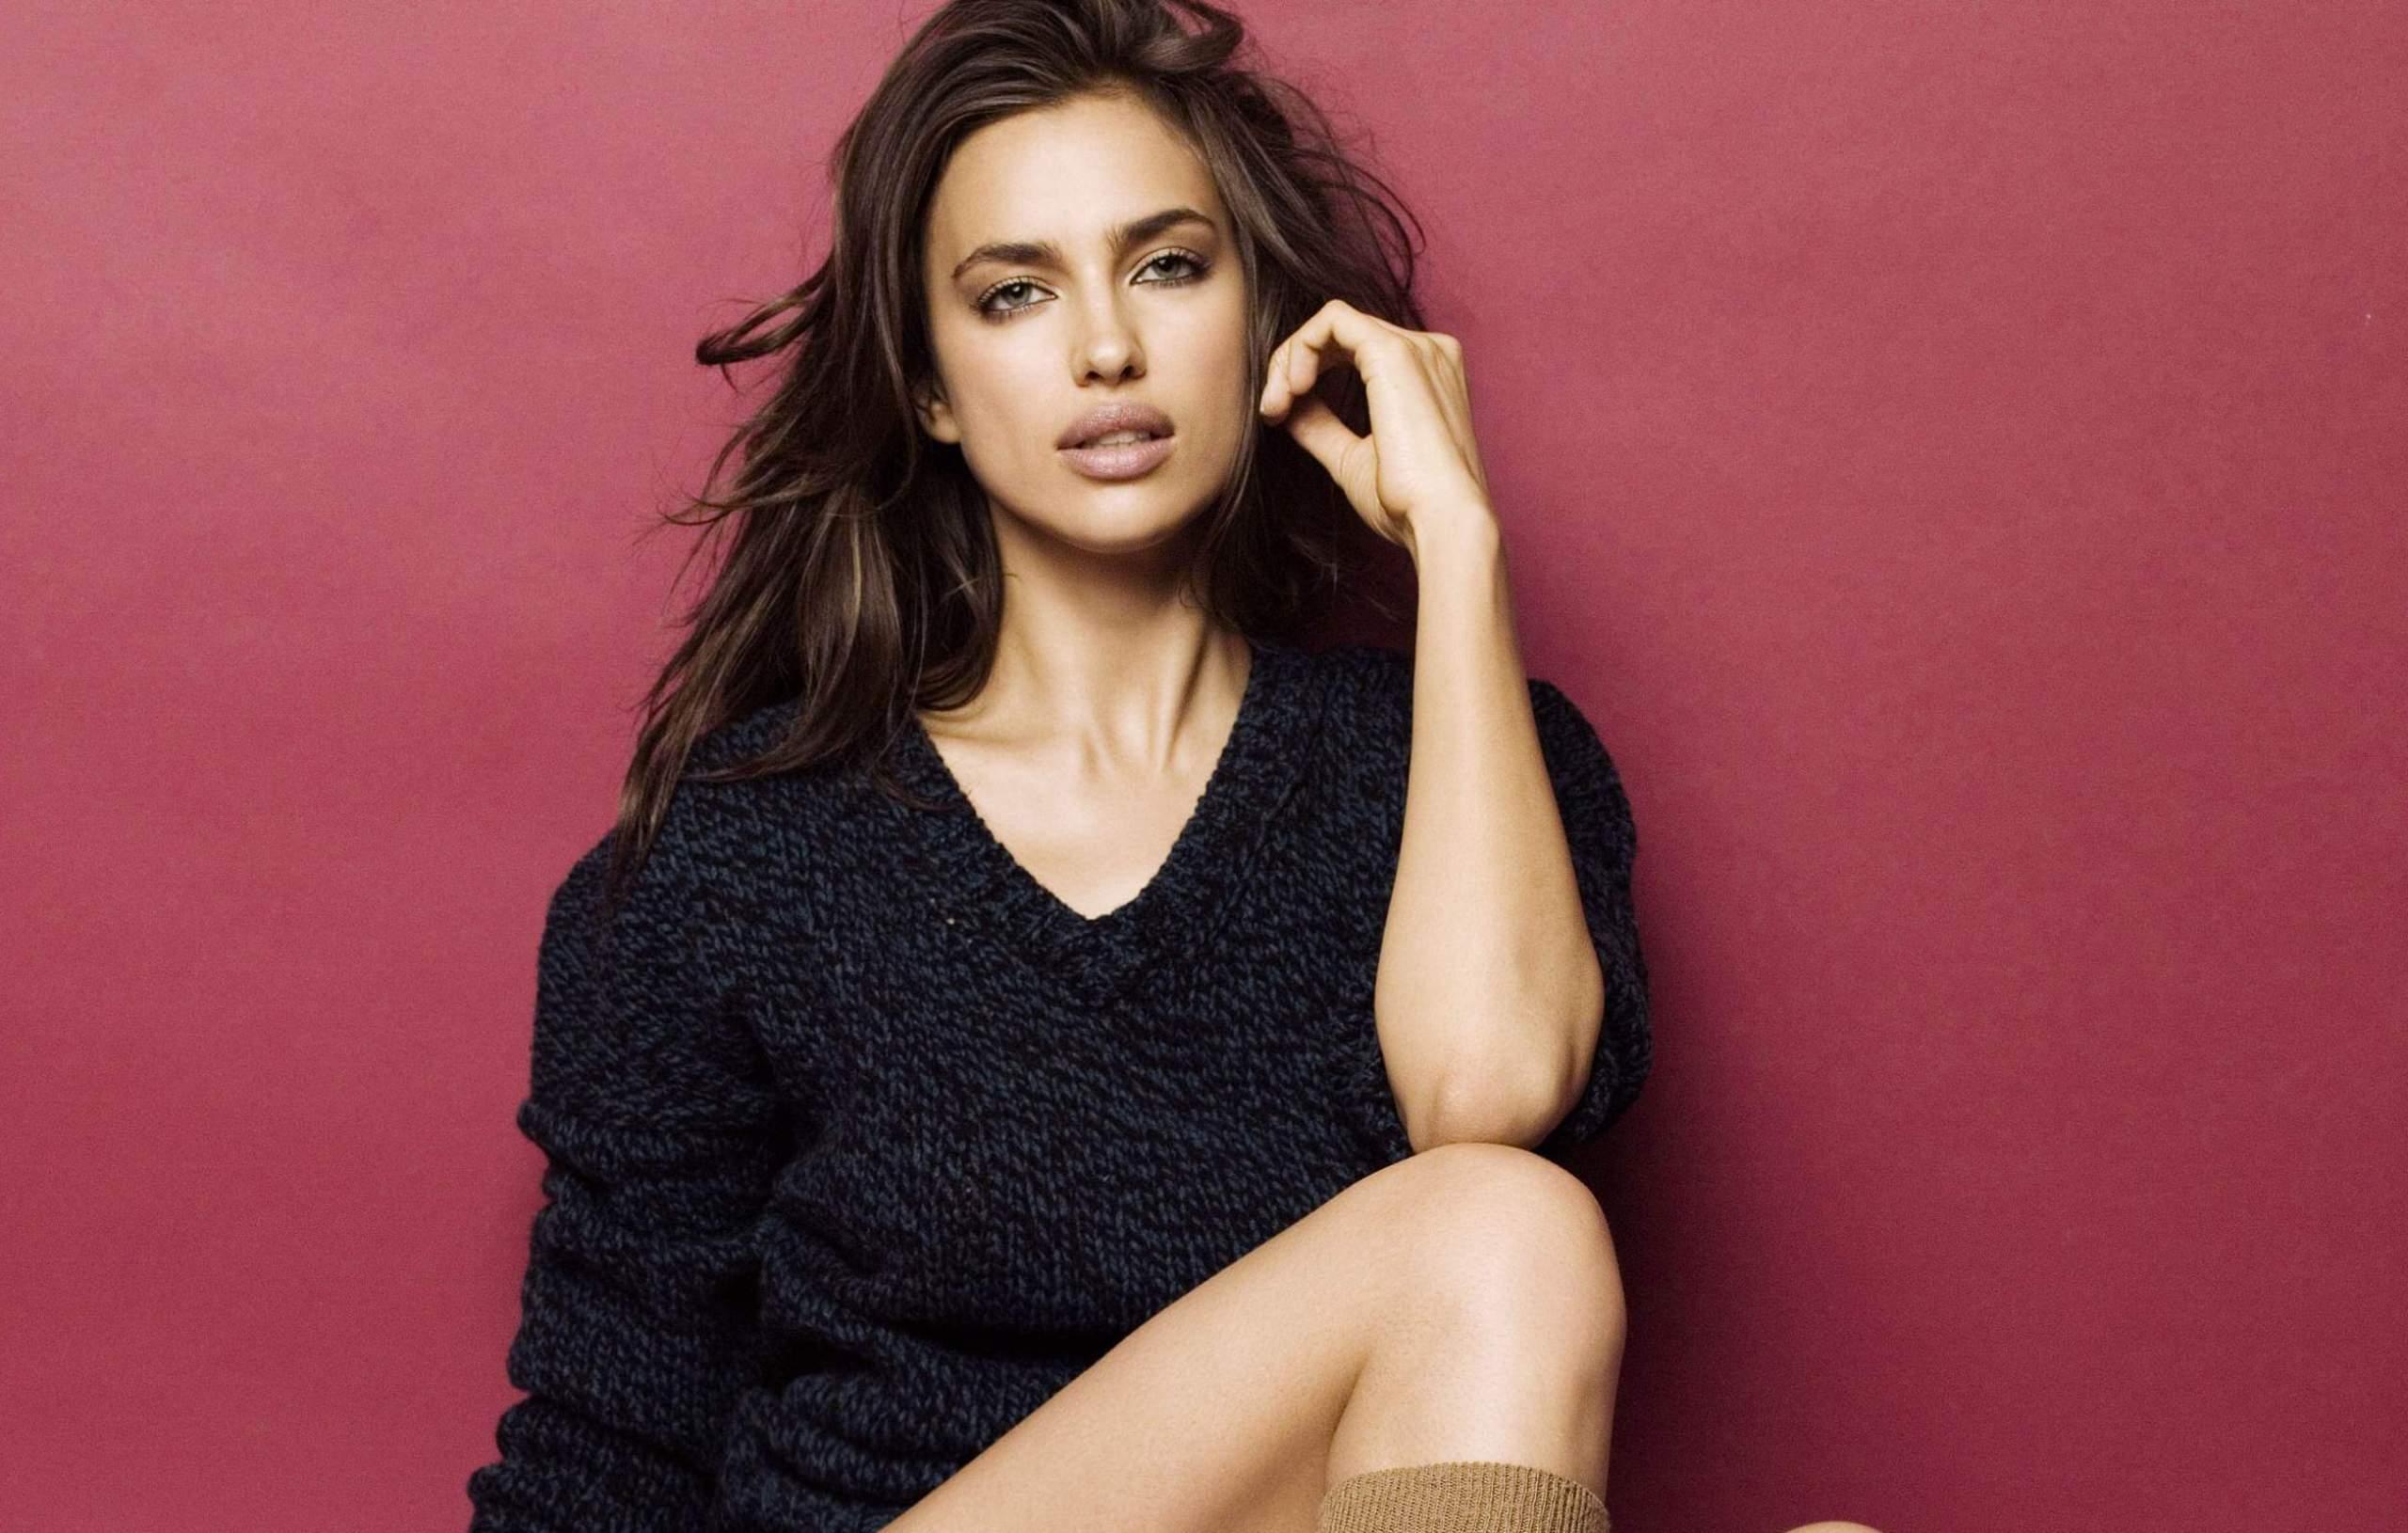 Irina Shayk HD